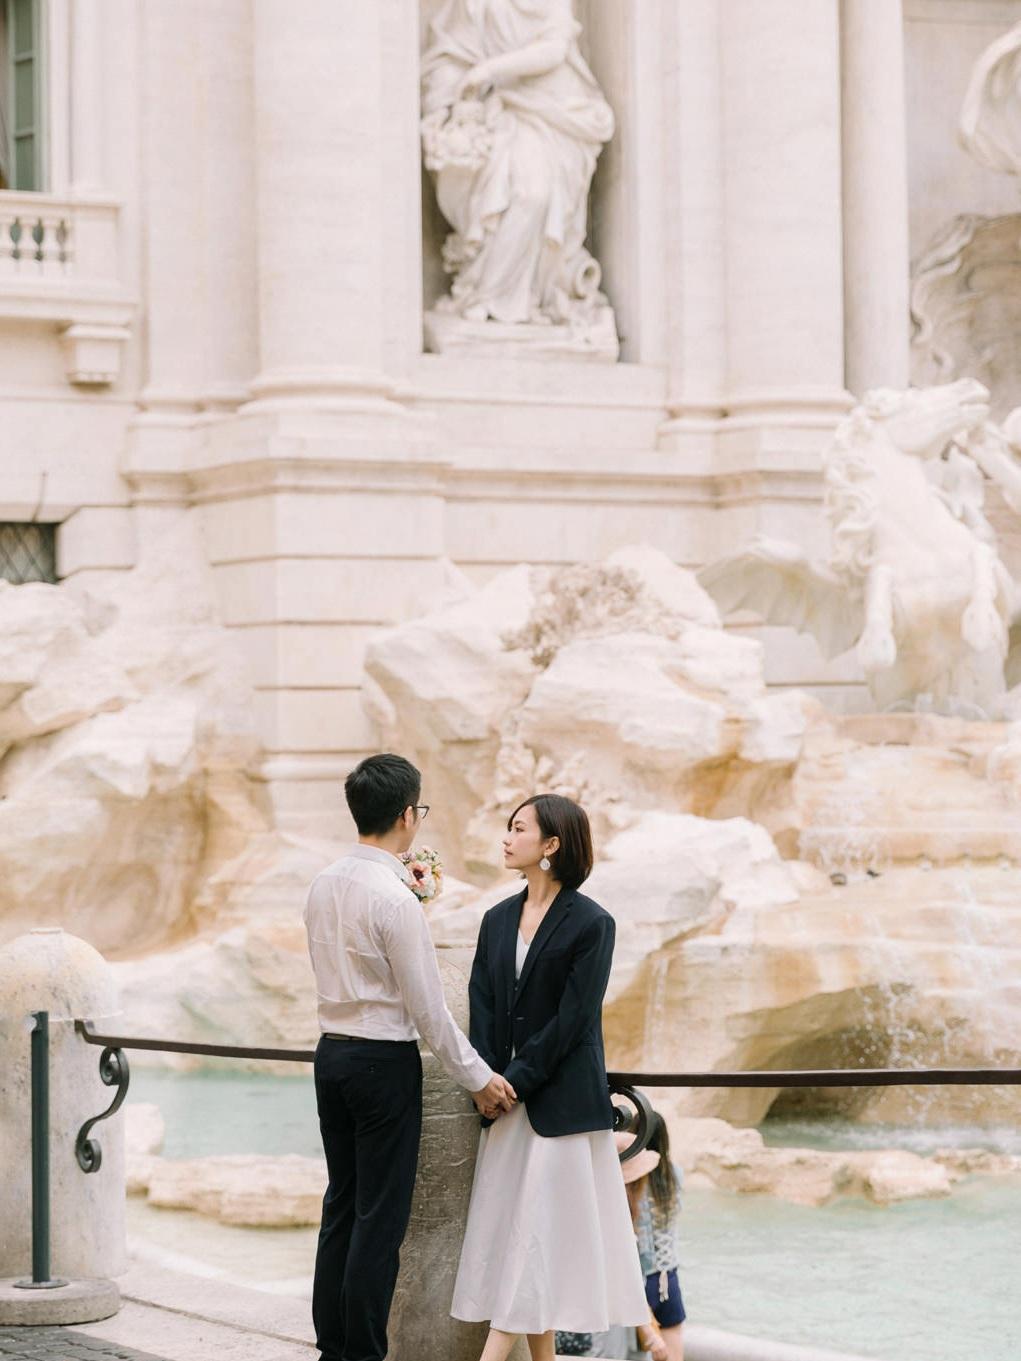 004_rome_fine_art_film_wedding_photography_chymo_more.jpg